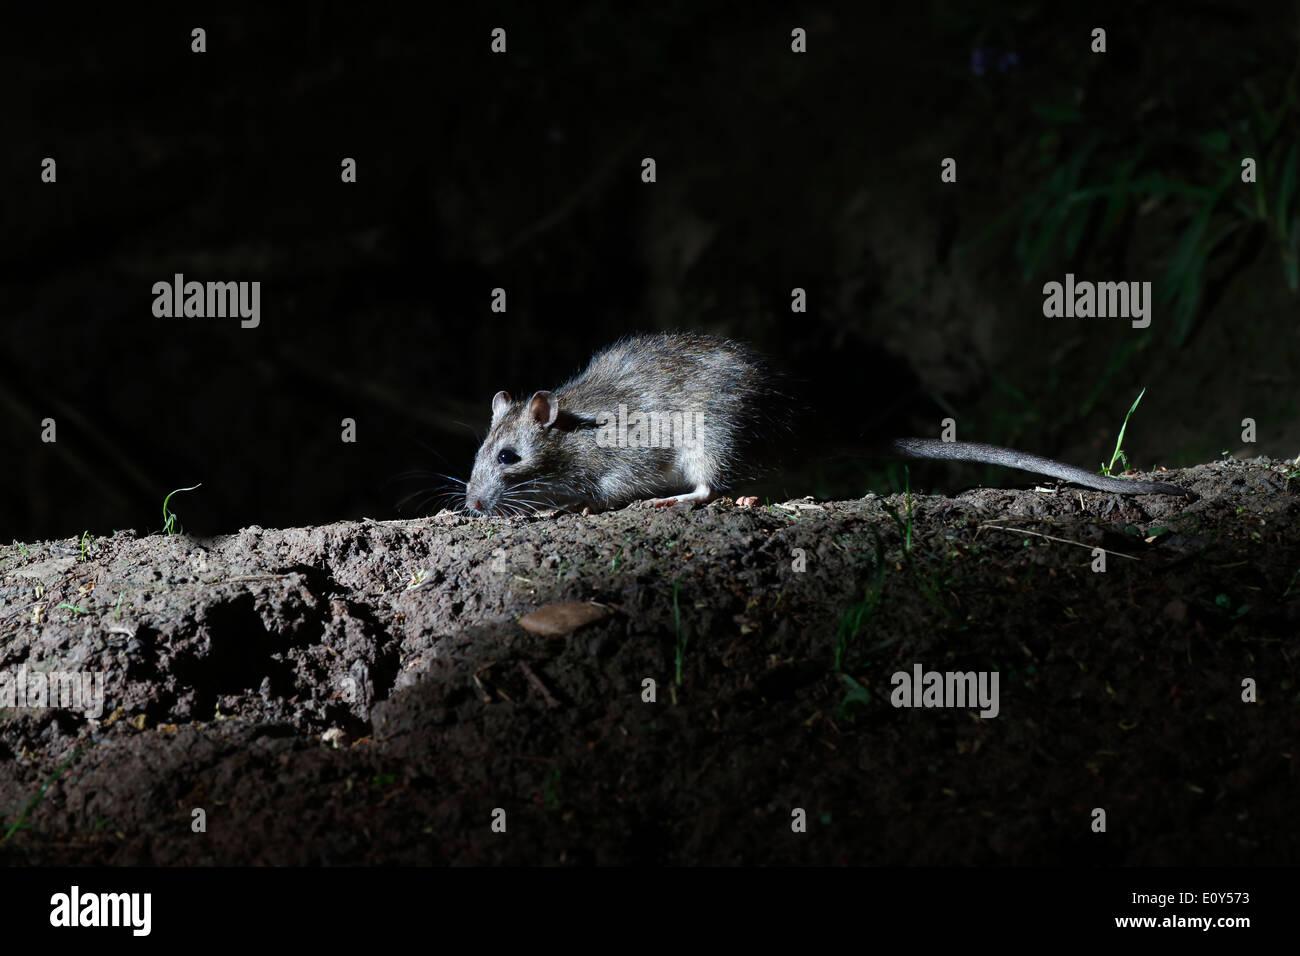 Brown rat, Rattus norvegicus, single mammal on ground, Warwickshire, May 2014 - Stock Image